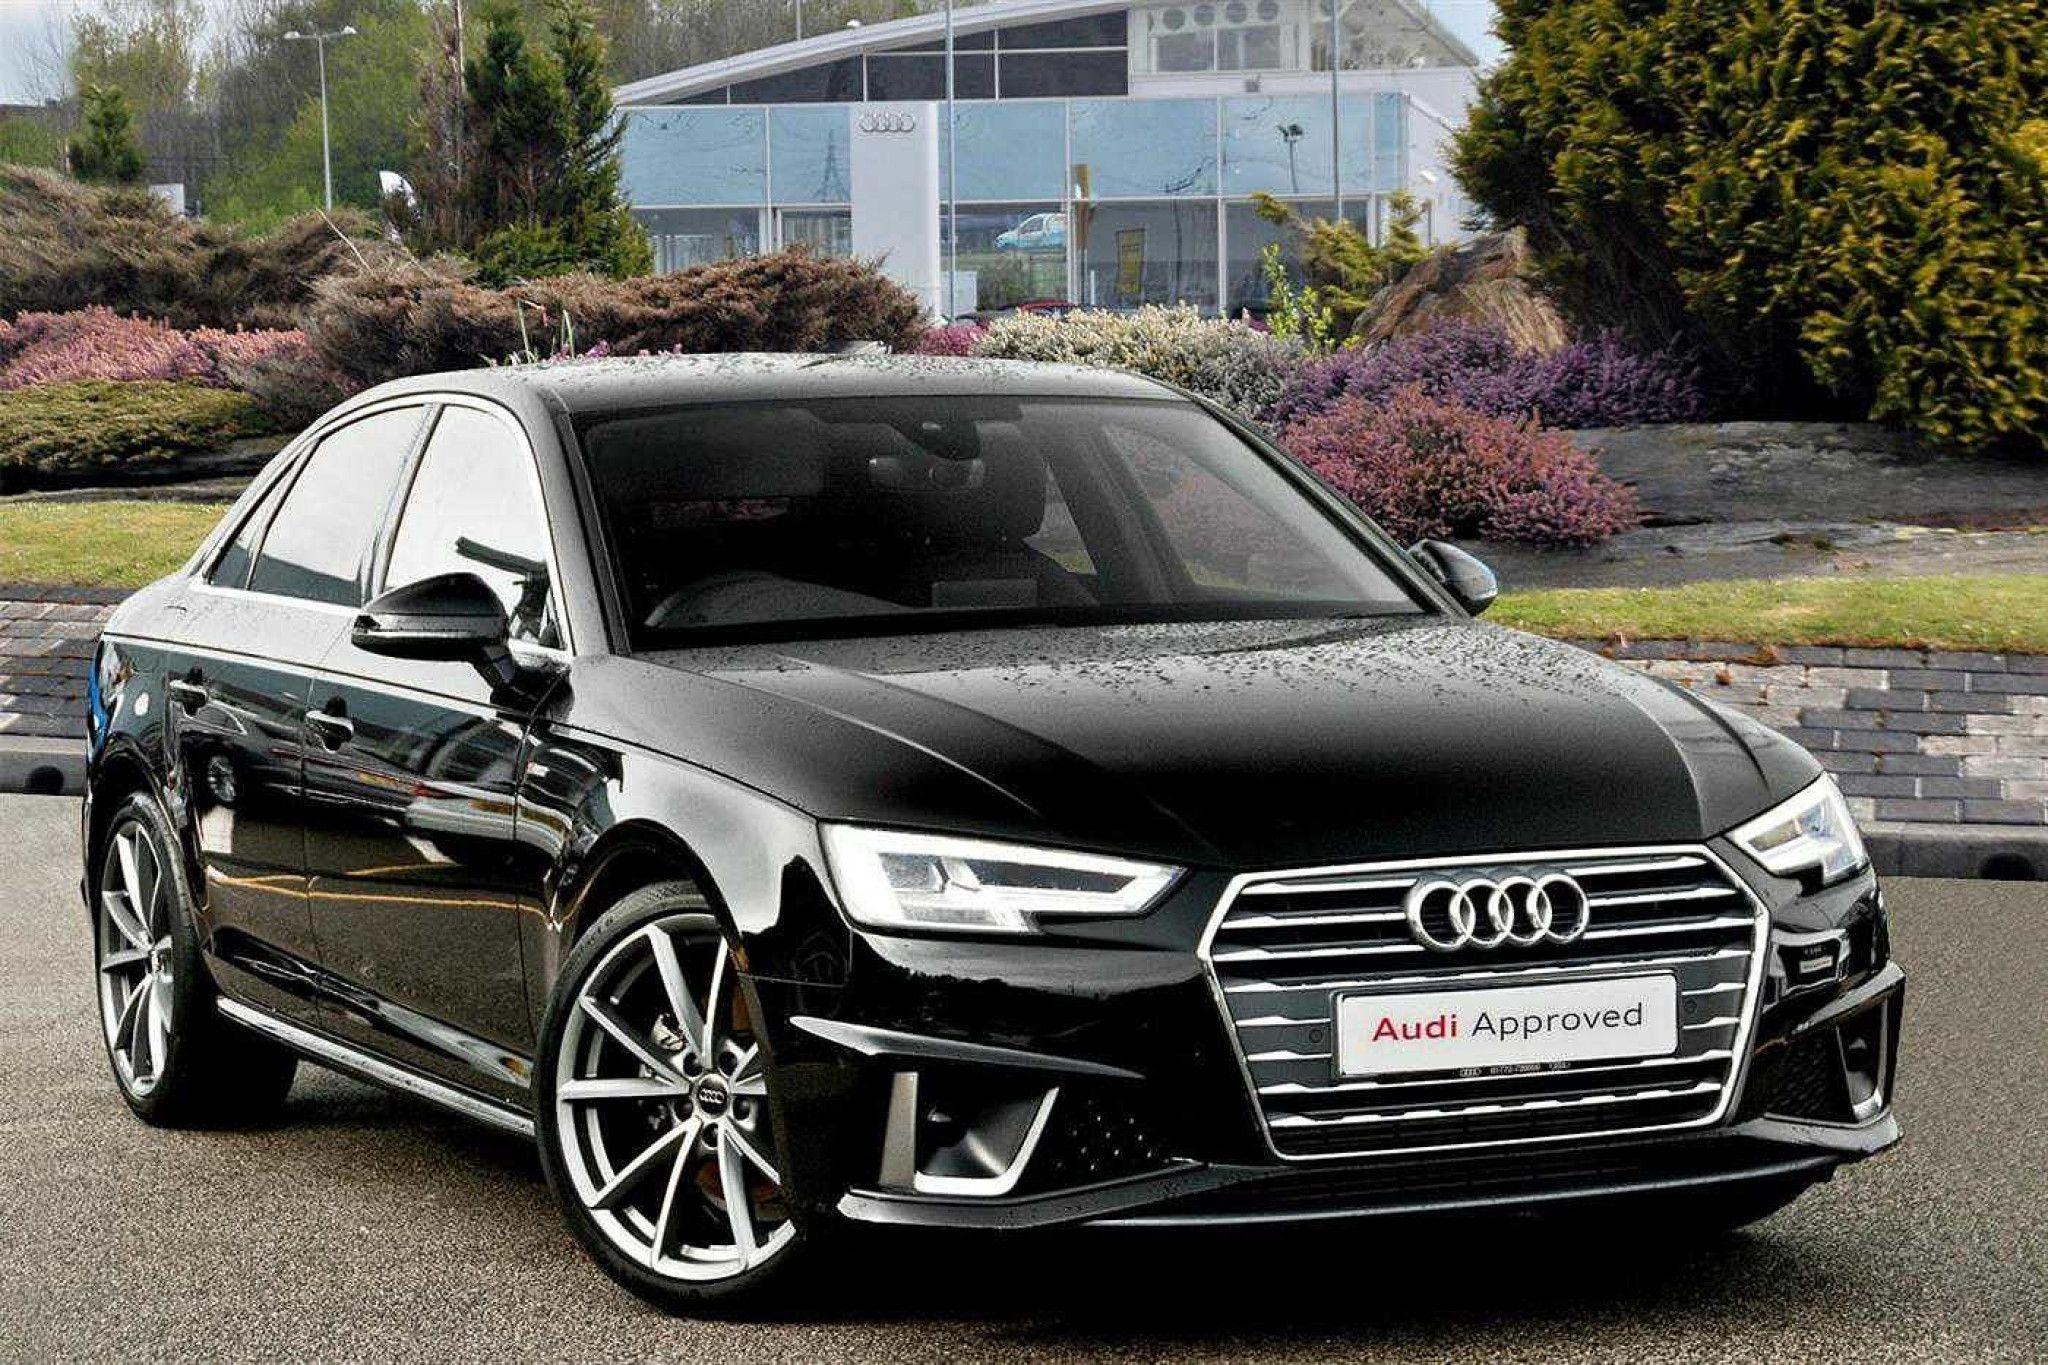 Audi A4 35 Tfsi S Line 4Dr Audi a4, Audi, Audi a3